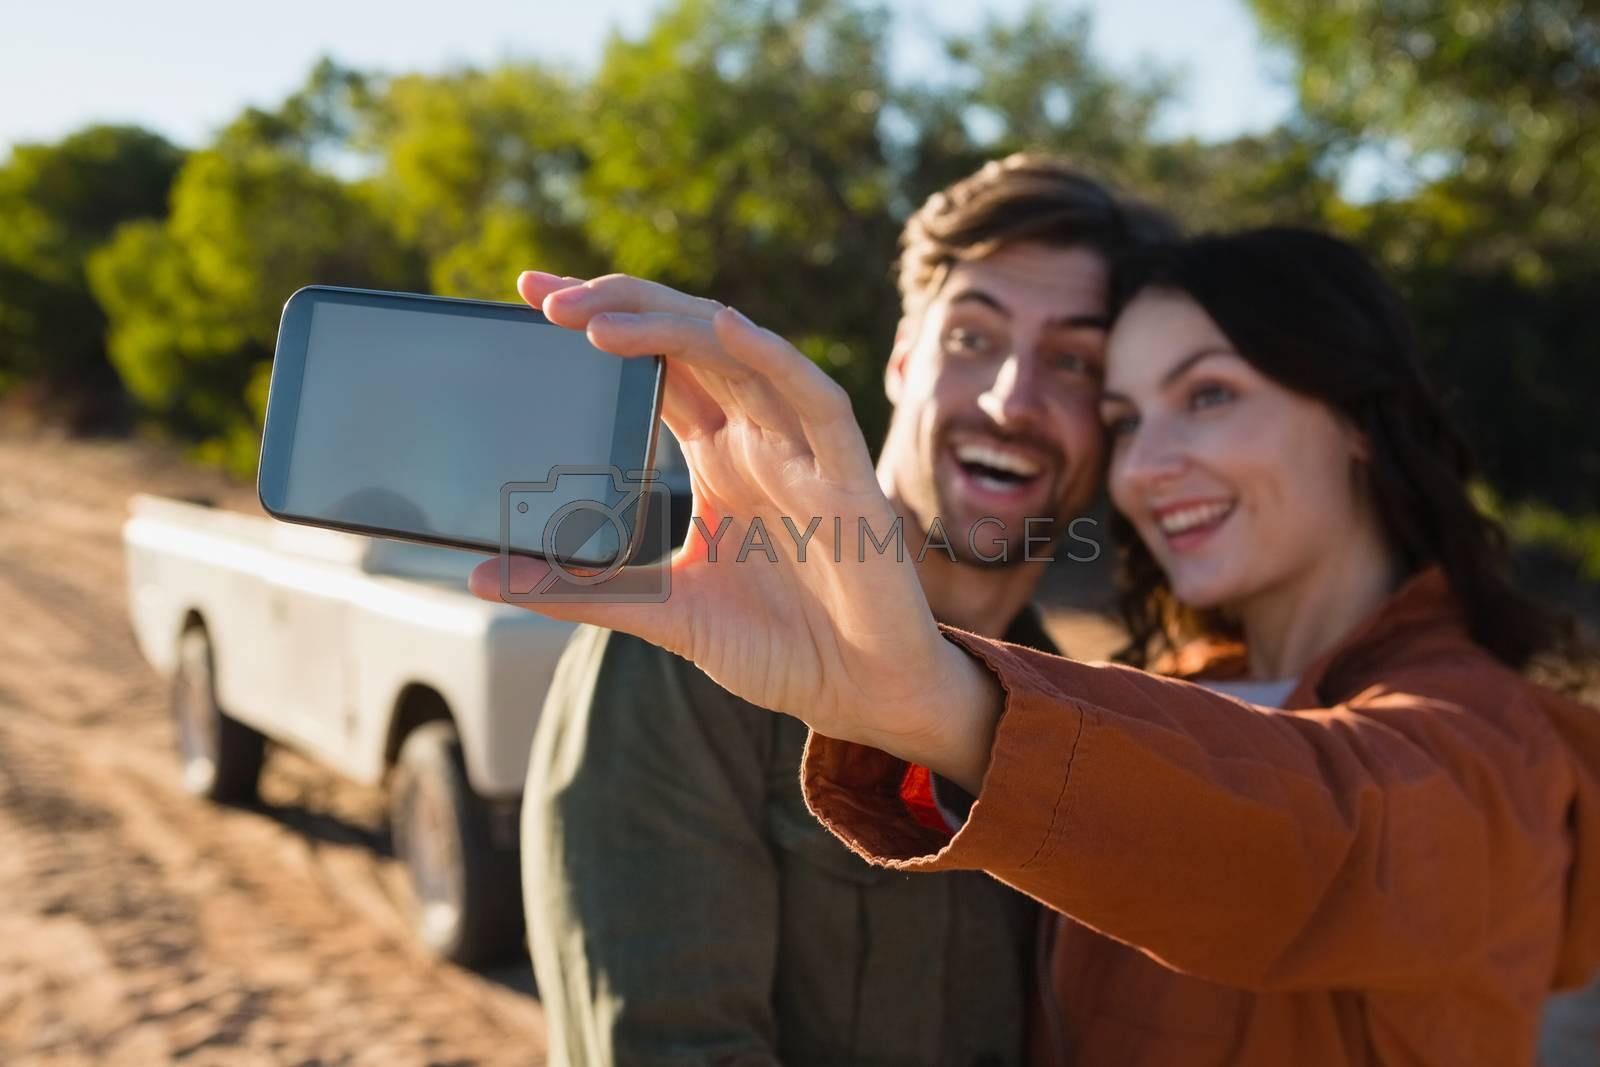 Happy woman taking selfie with man by Wavebreakmedia